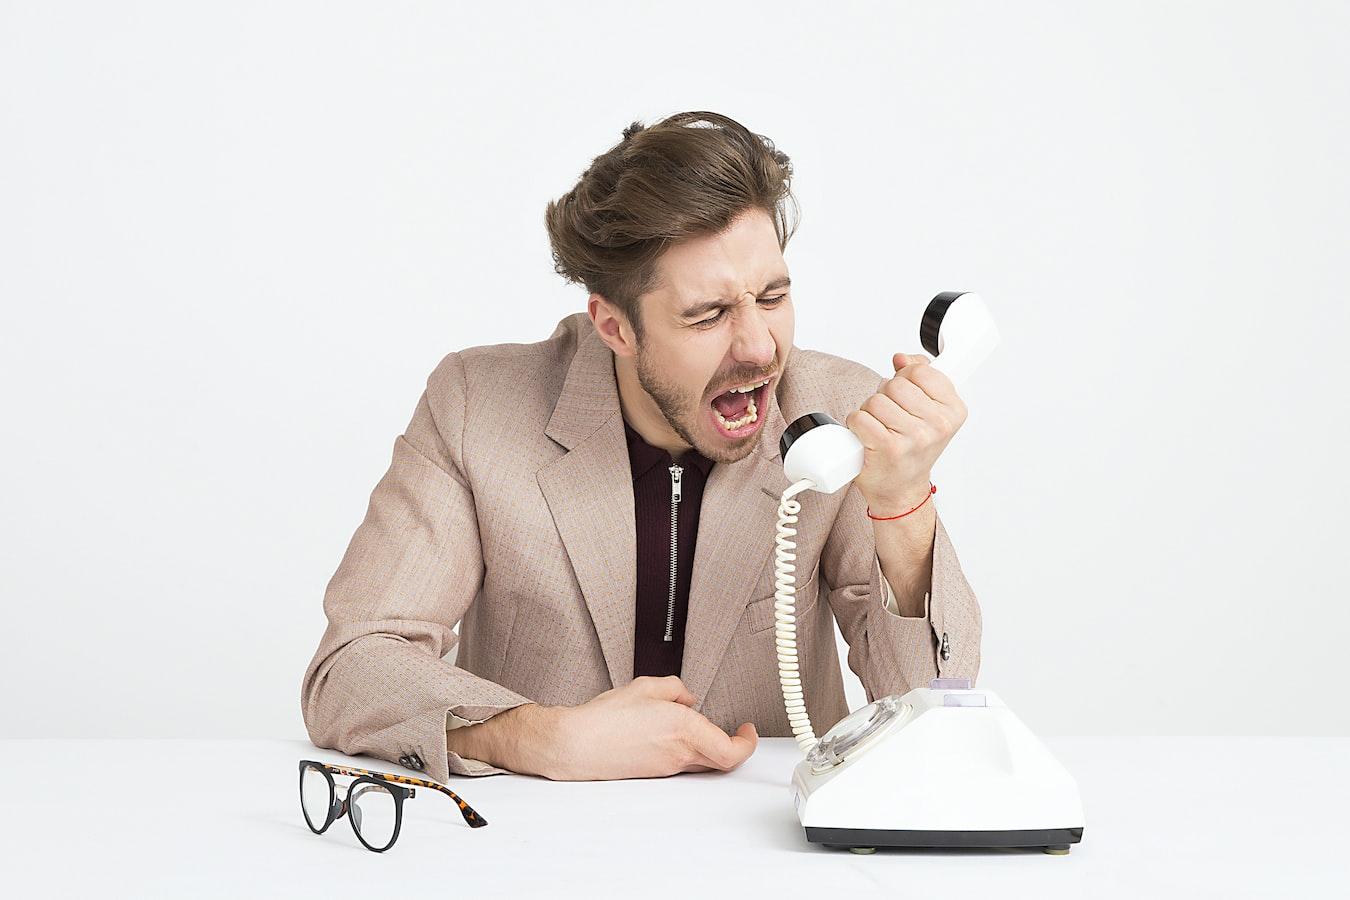 Menjadikan Lembur Sebagai Solusi?, lembur adalah, lemburan, akibat lembur, masbobz.com, masbobz, Akibat komunikasi buruk dengan klien